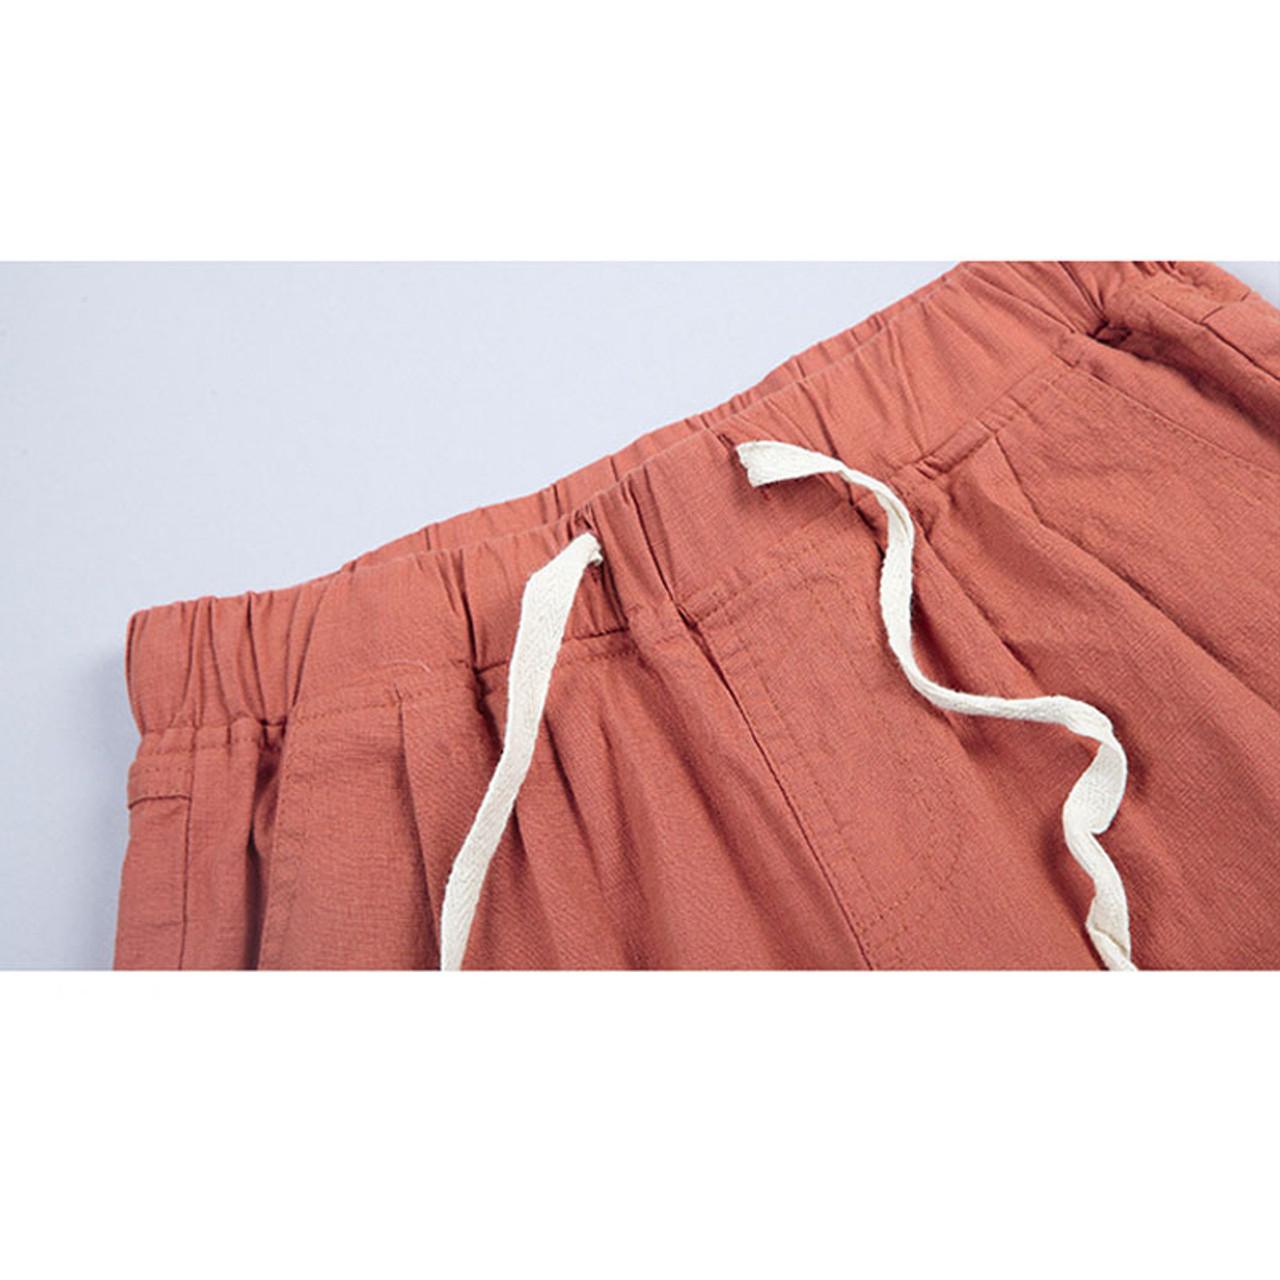 bf3dc01e14b ... New 2018 Summer shorts women high waist Fashion Pleated Loose solid  cotton linen feminino short for ...